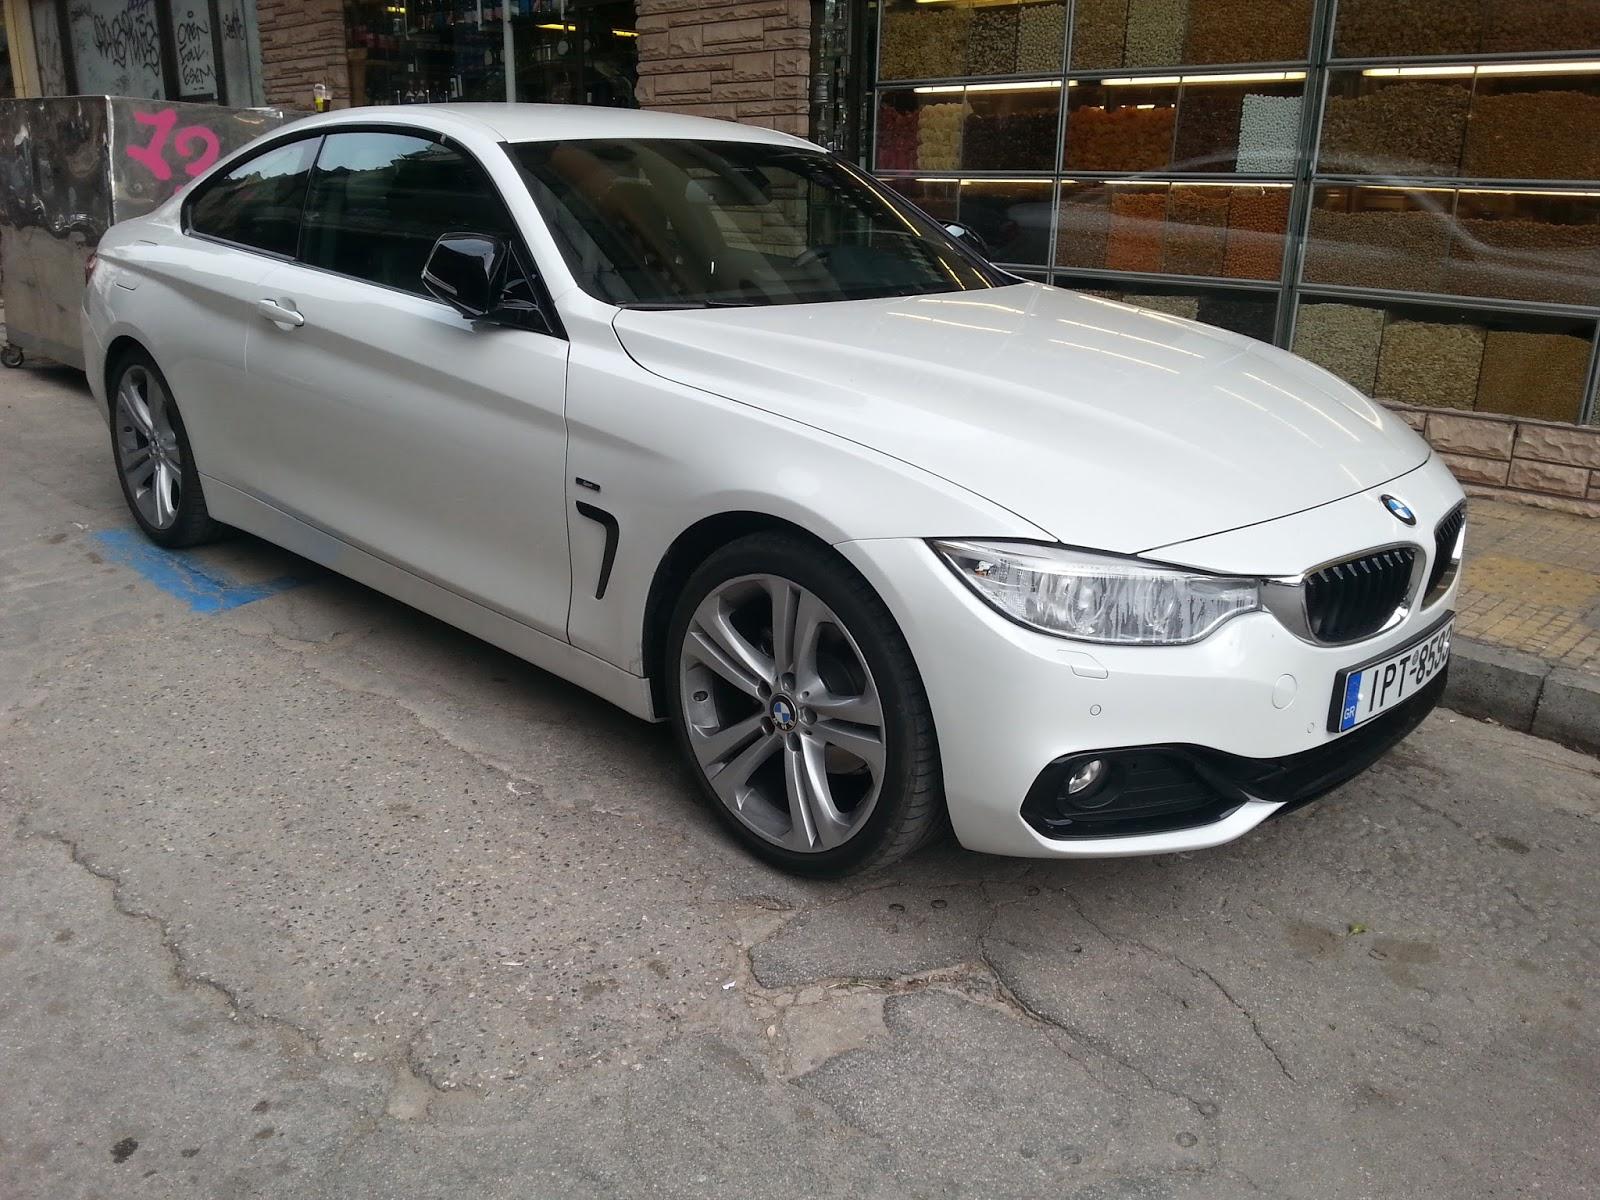 f2 1 Μπορεί να με συγκινήσει η BMW 420i; TEST, ΔΟΚΙΜΕΣ